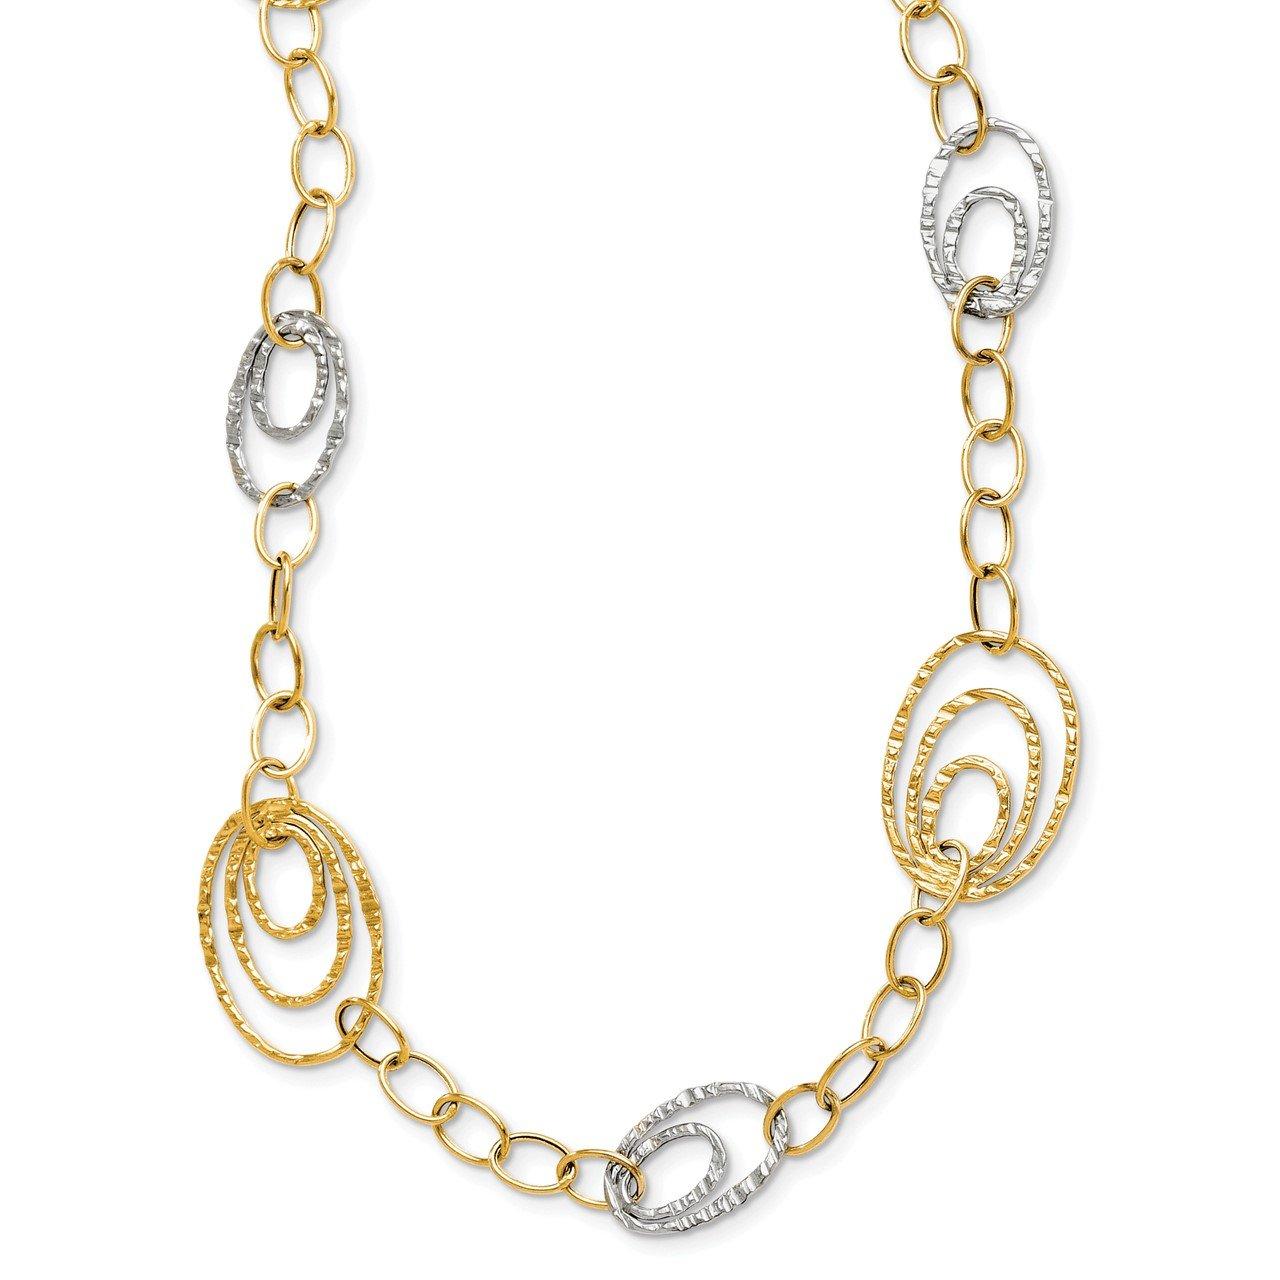 Leslie's 14K Two-tone Fancy Link Necklace